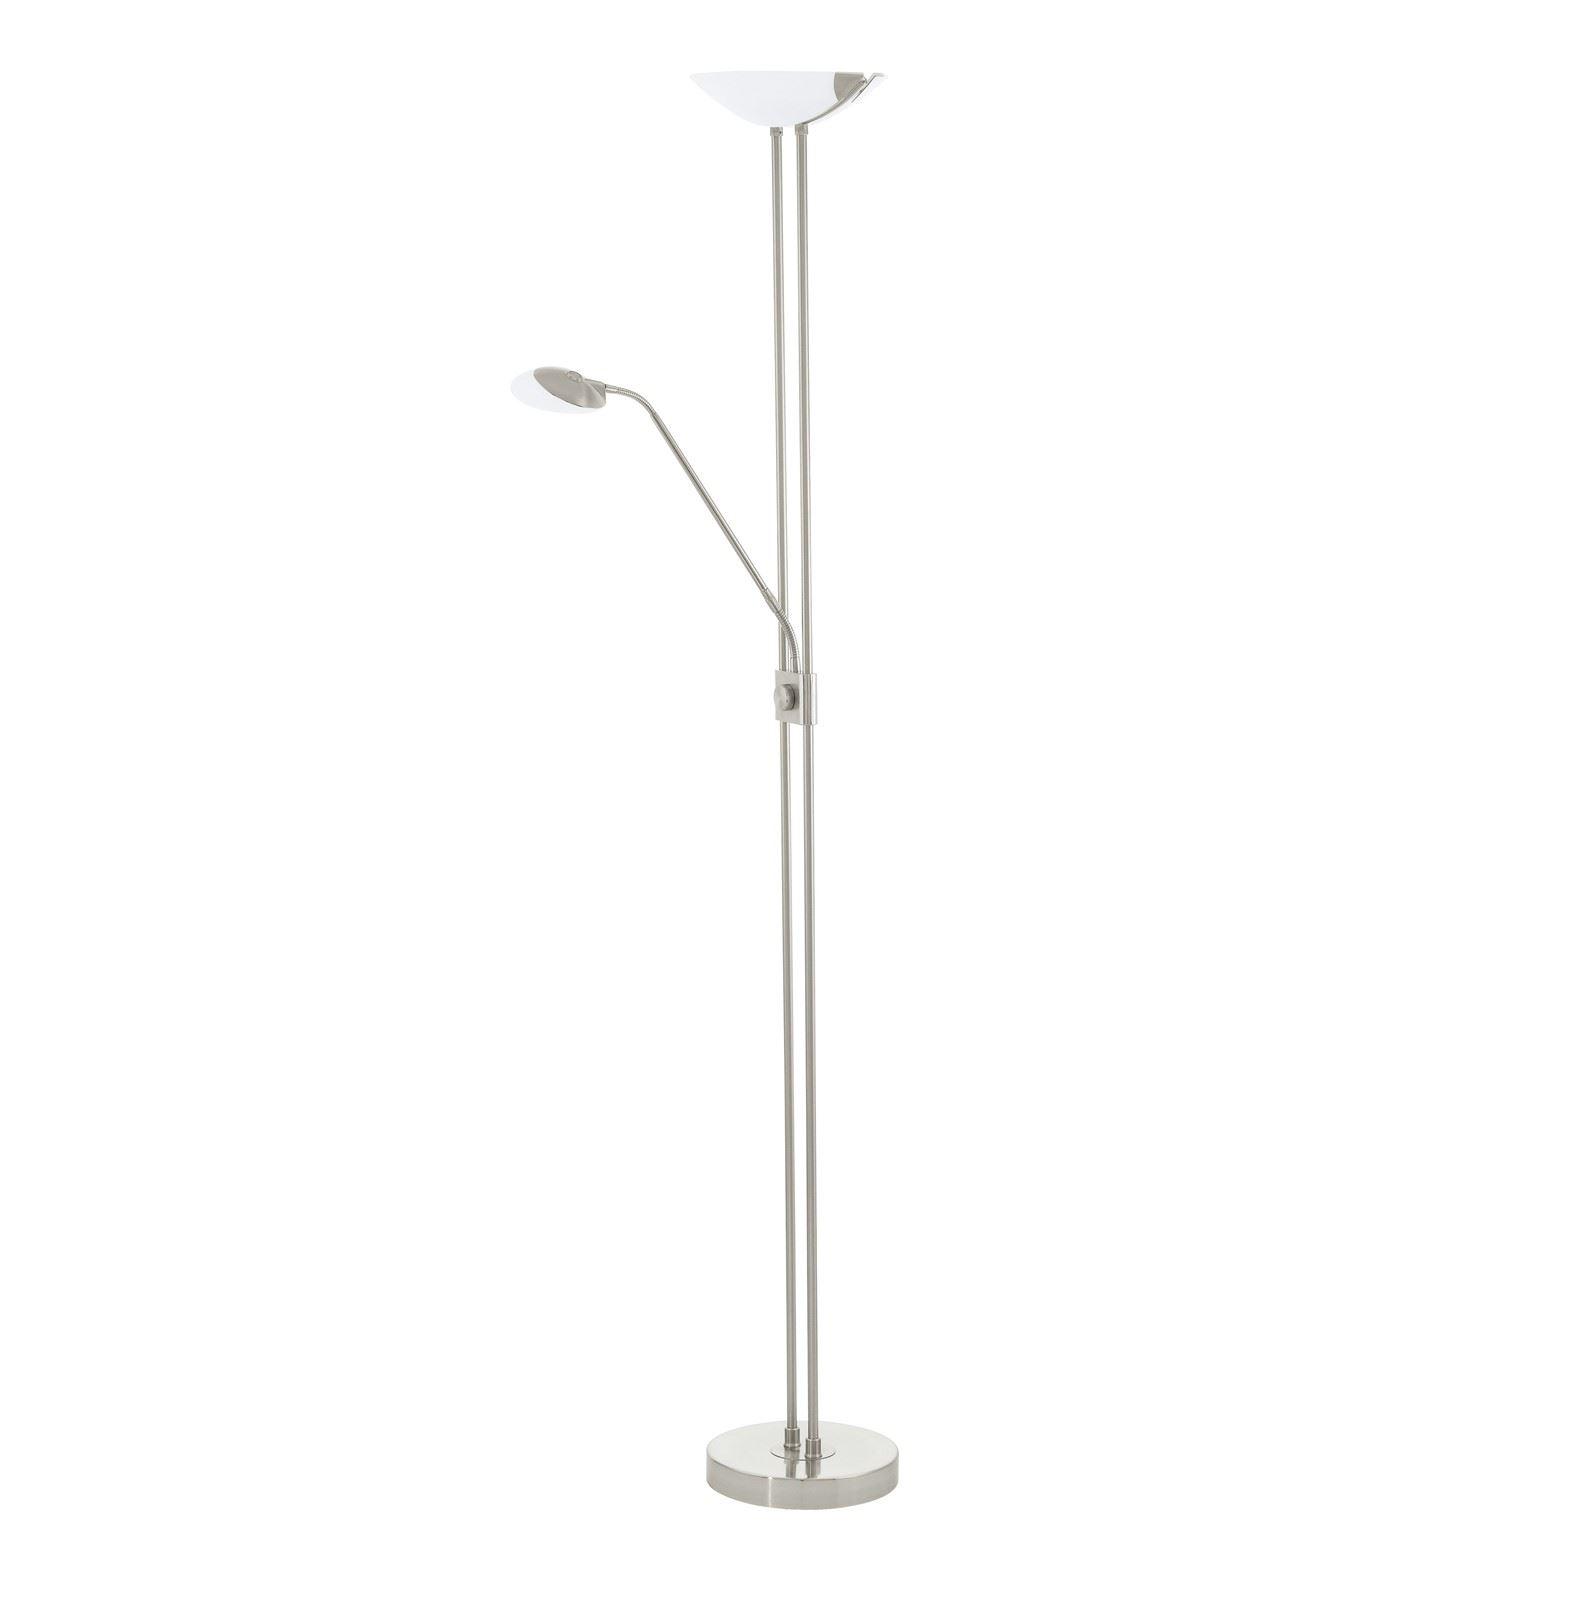 Baya Led Floor Lamp 5 Years Warranty Satin Nickel Finish